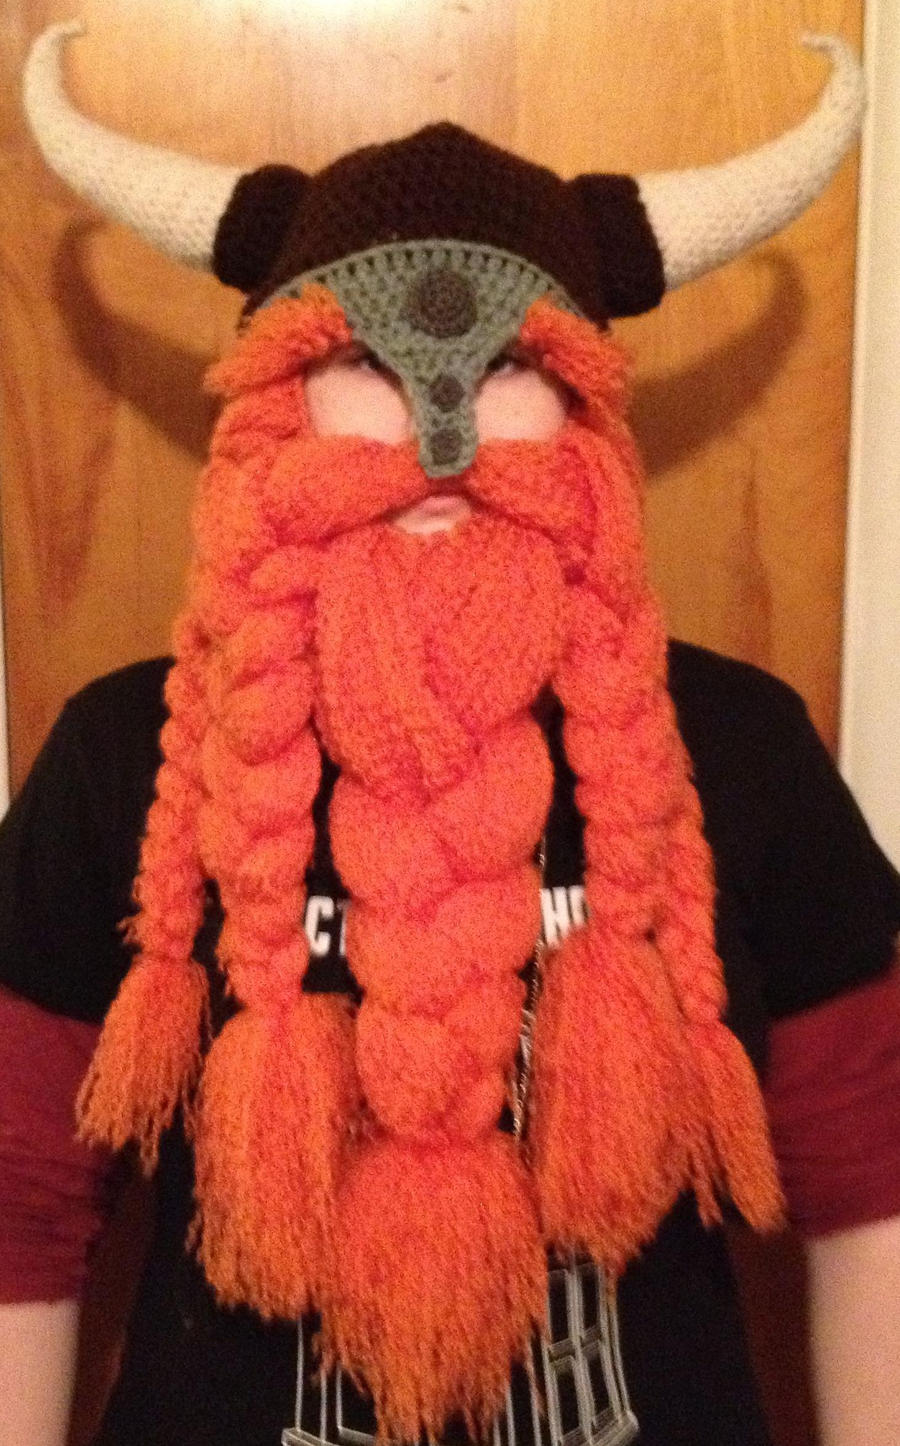 5 braid carrot colored beard by Drgibbs